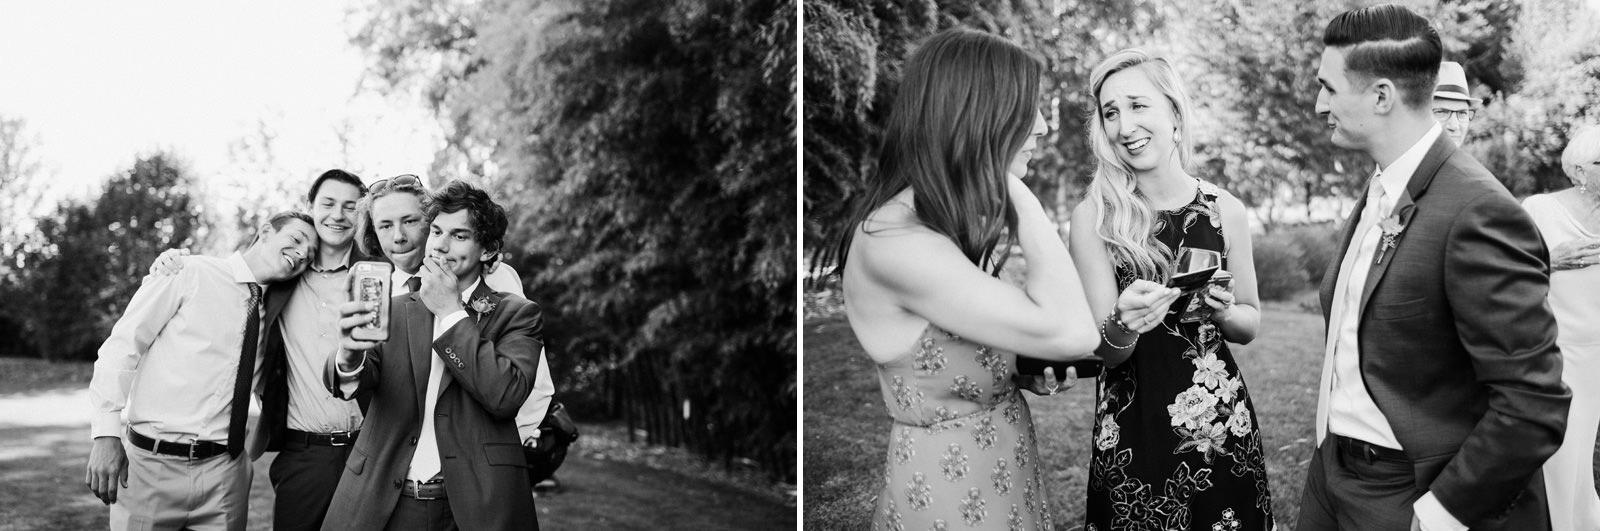 055-woodinville-lavendar-farm-wedding-with-golden-glowy-photos.jpg